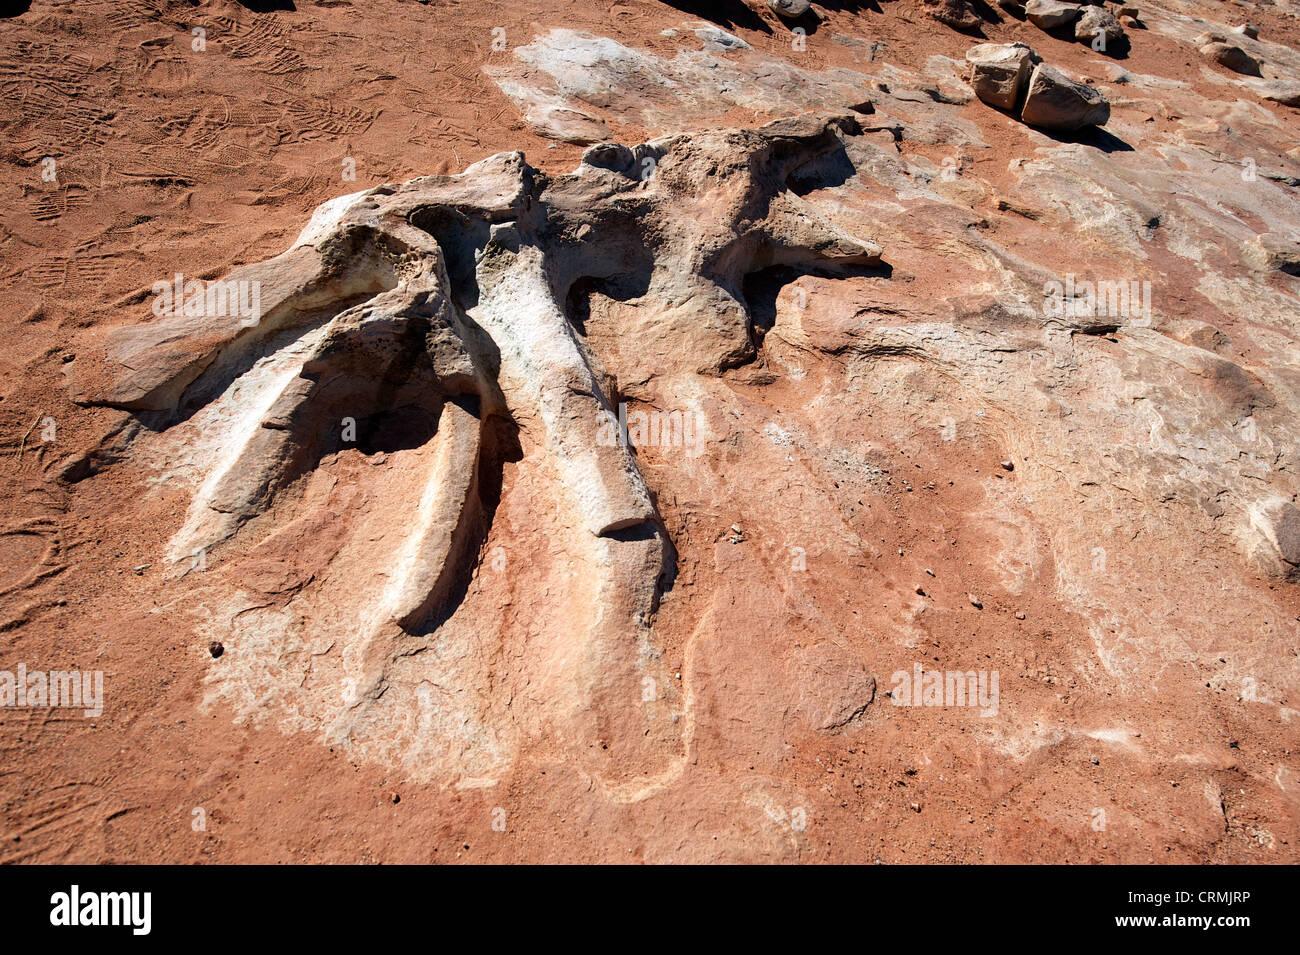 Fossilized dinosaur skeleton or bones detail, near Tuba City, AZ, US - Stock Image